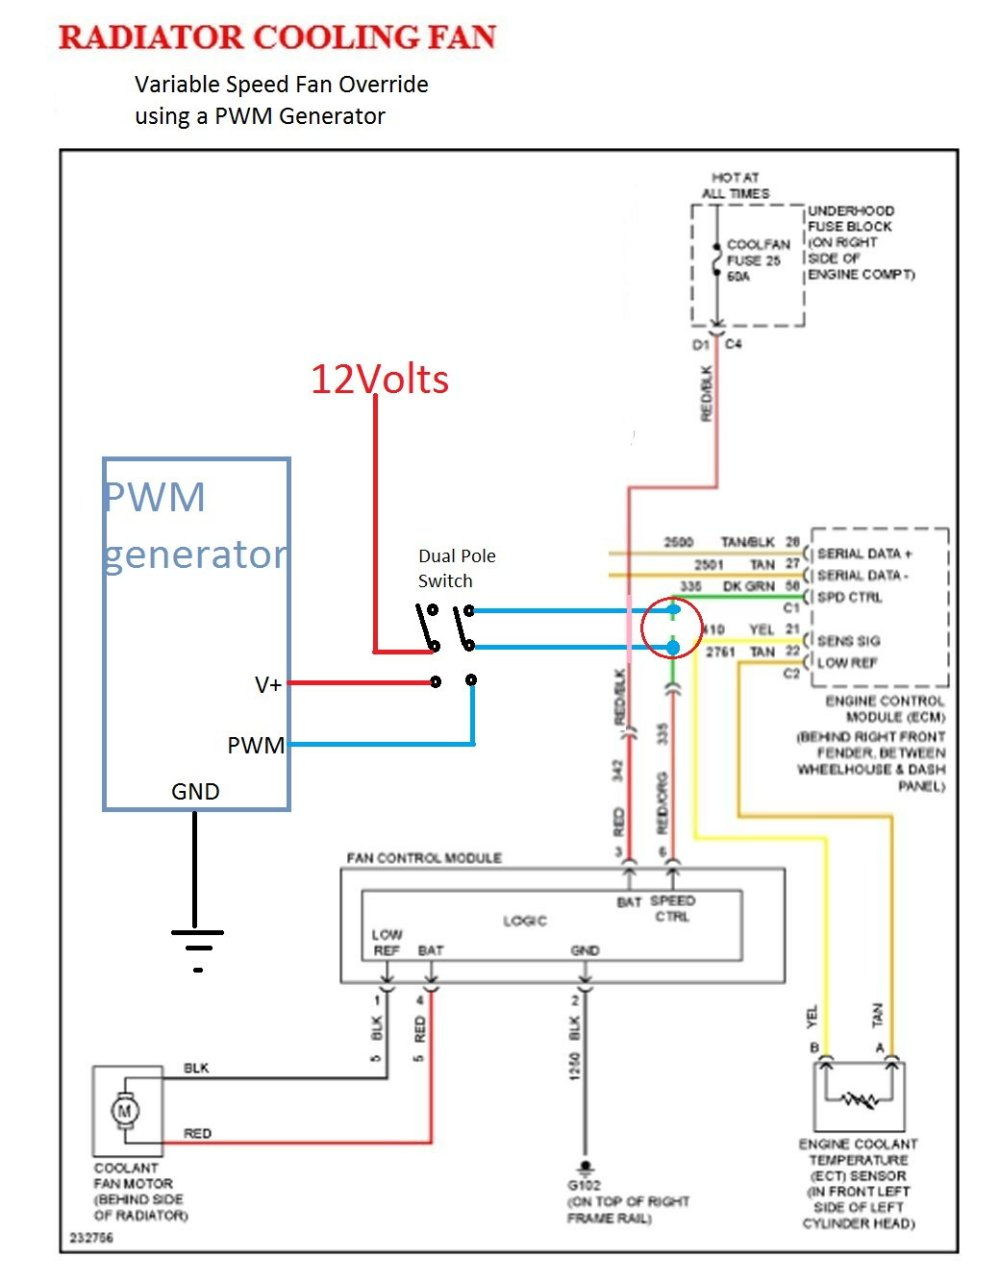 medium resolution of fan wiring diagram c6 z06 schema diagram database fan wiring diagram c6 z06